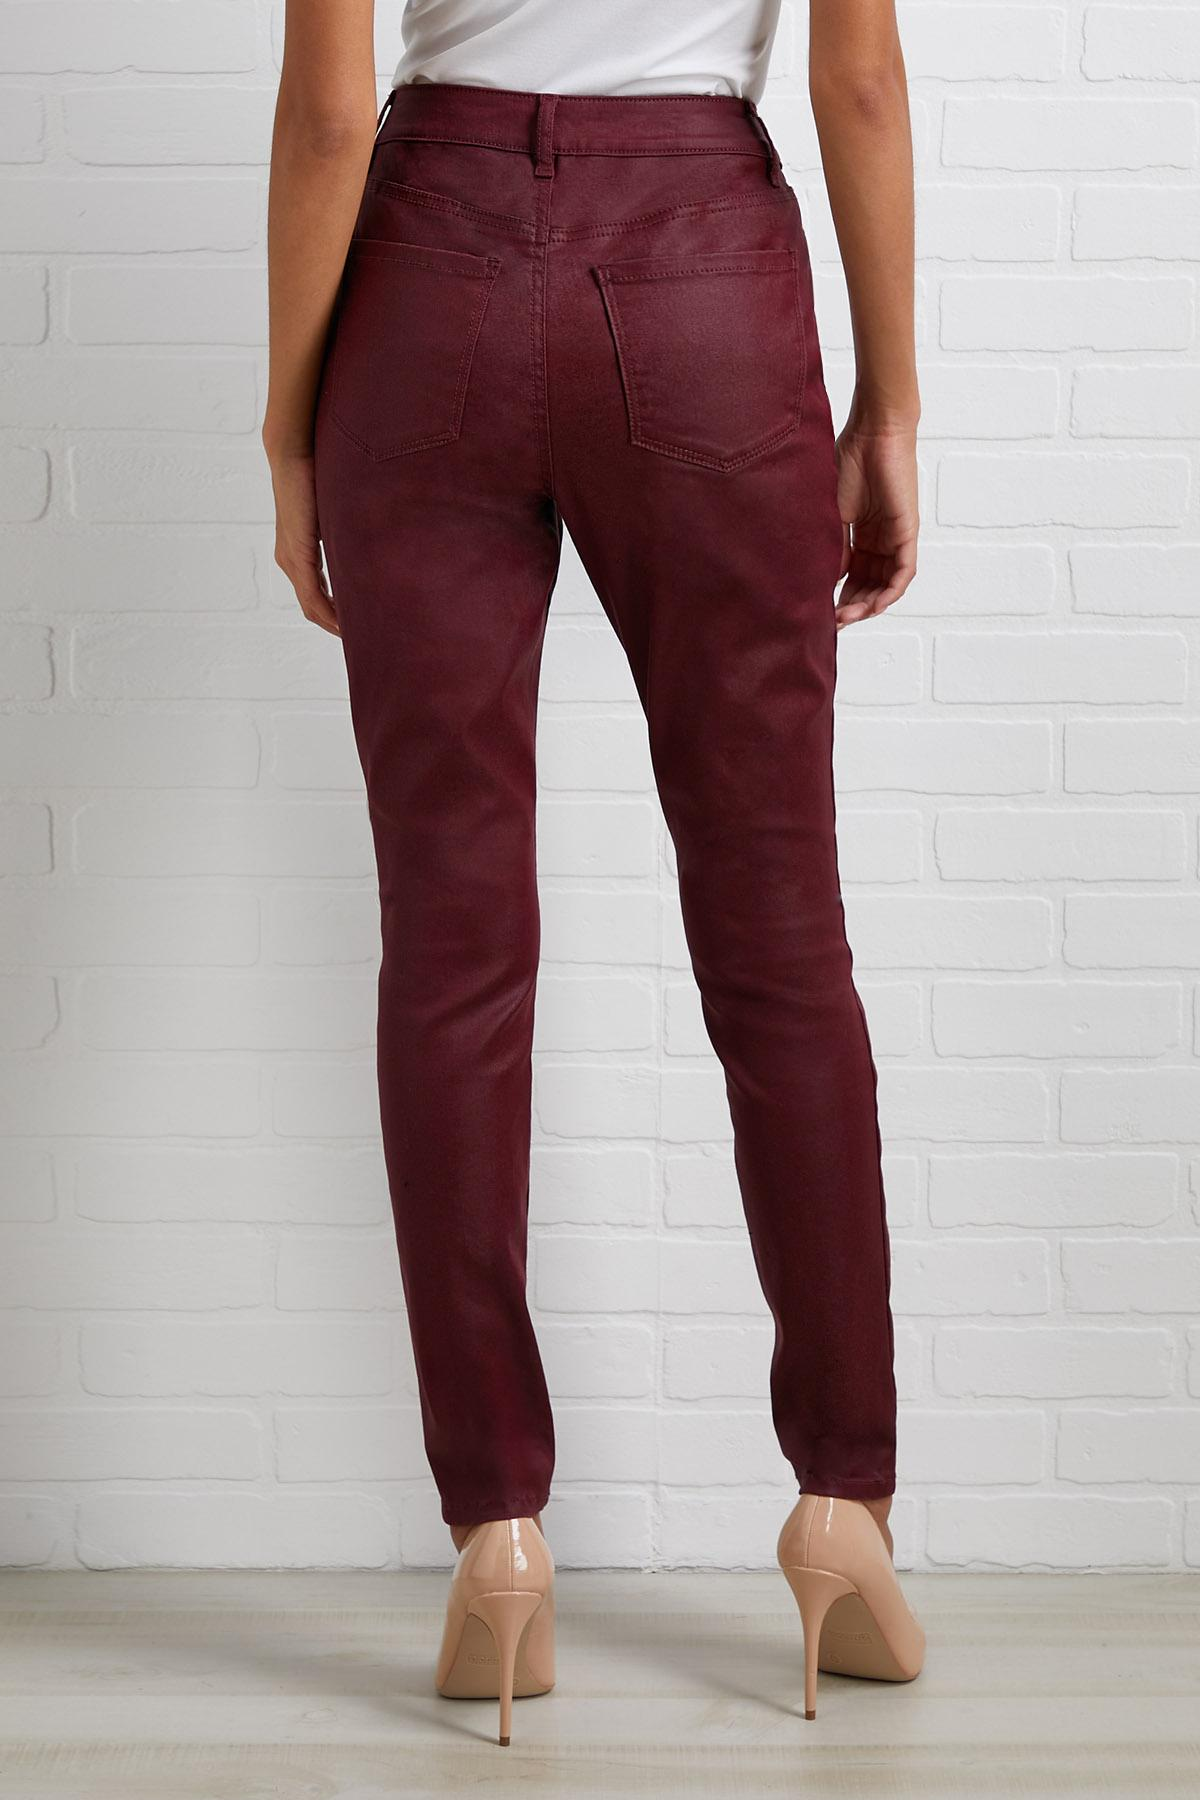 More Merlot Jeans